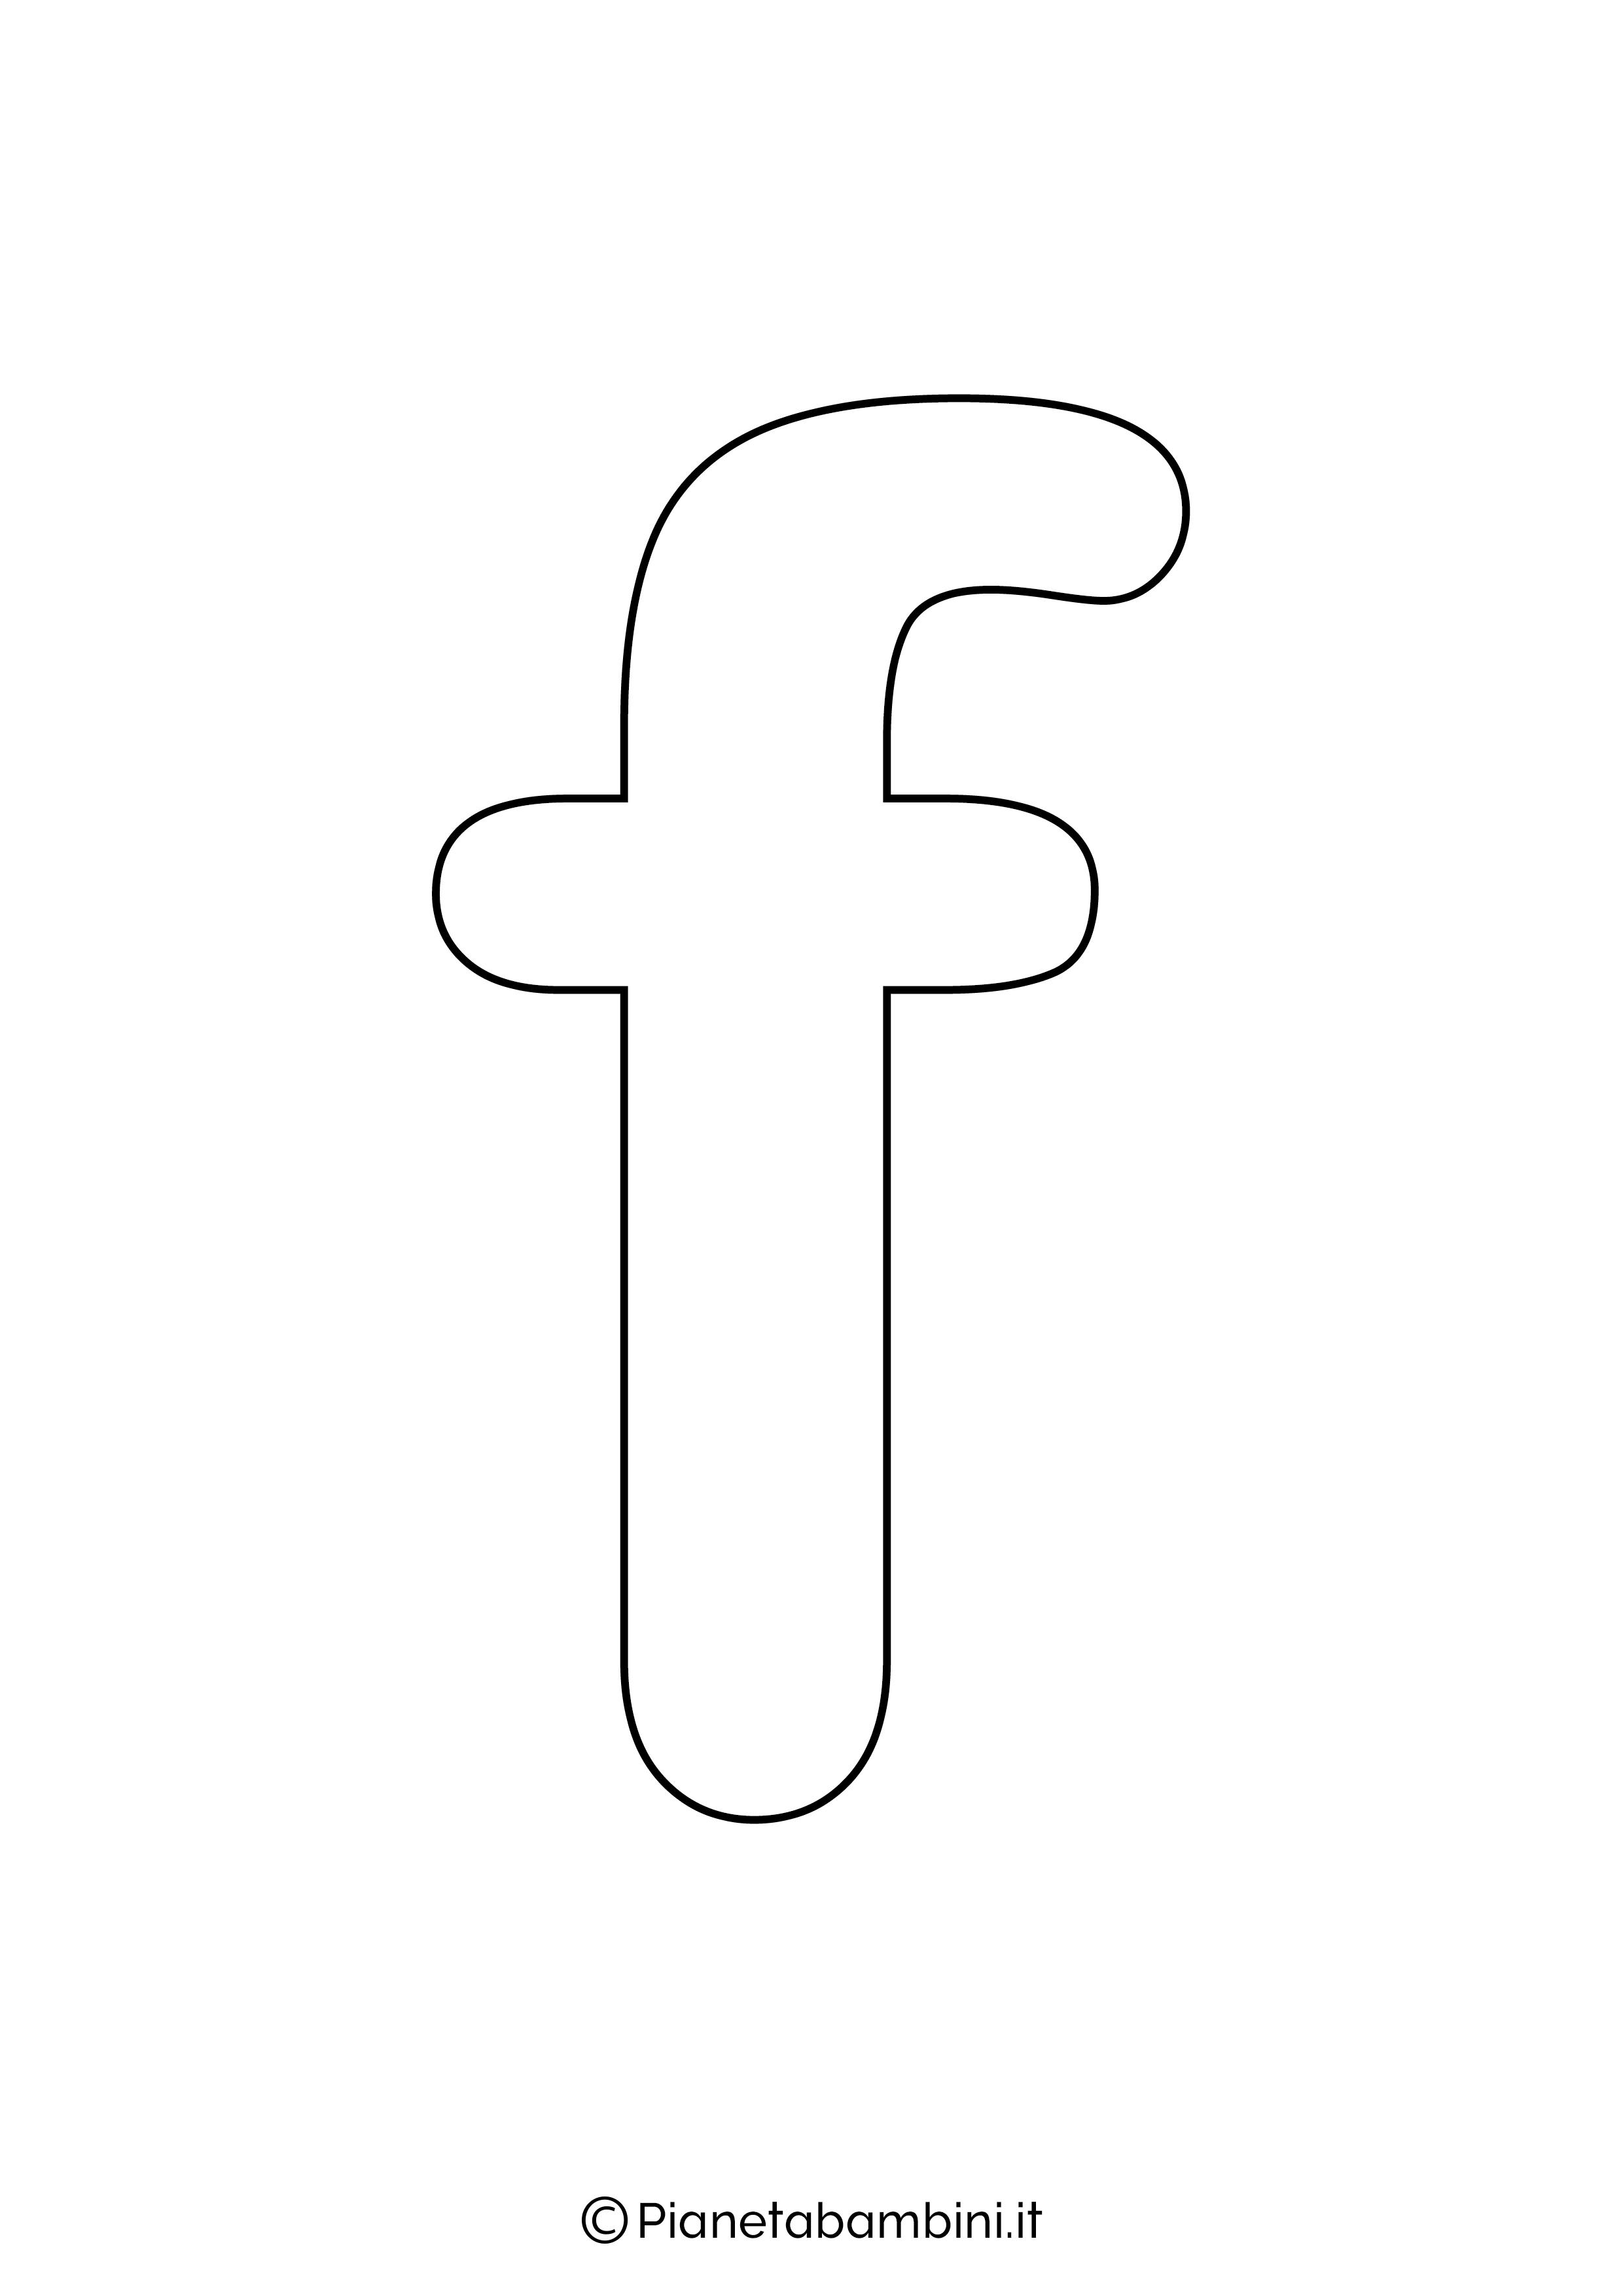 Lettera F minuscola da stampare